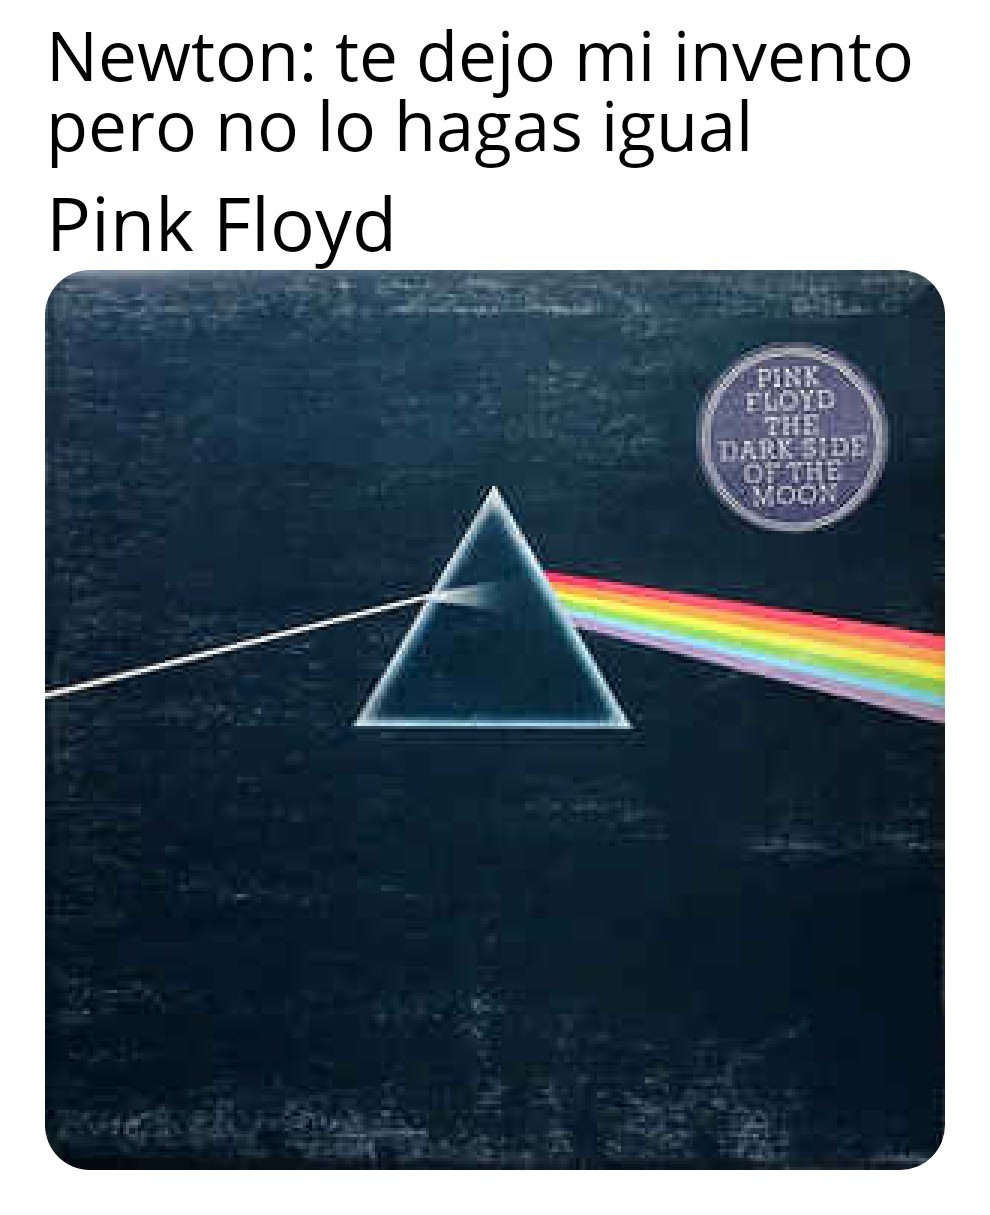 The dark side of the moon - meme